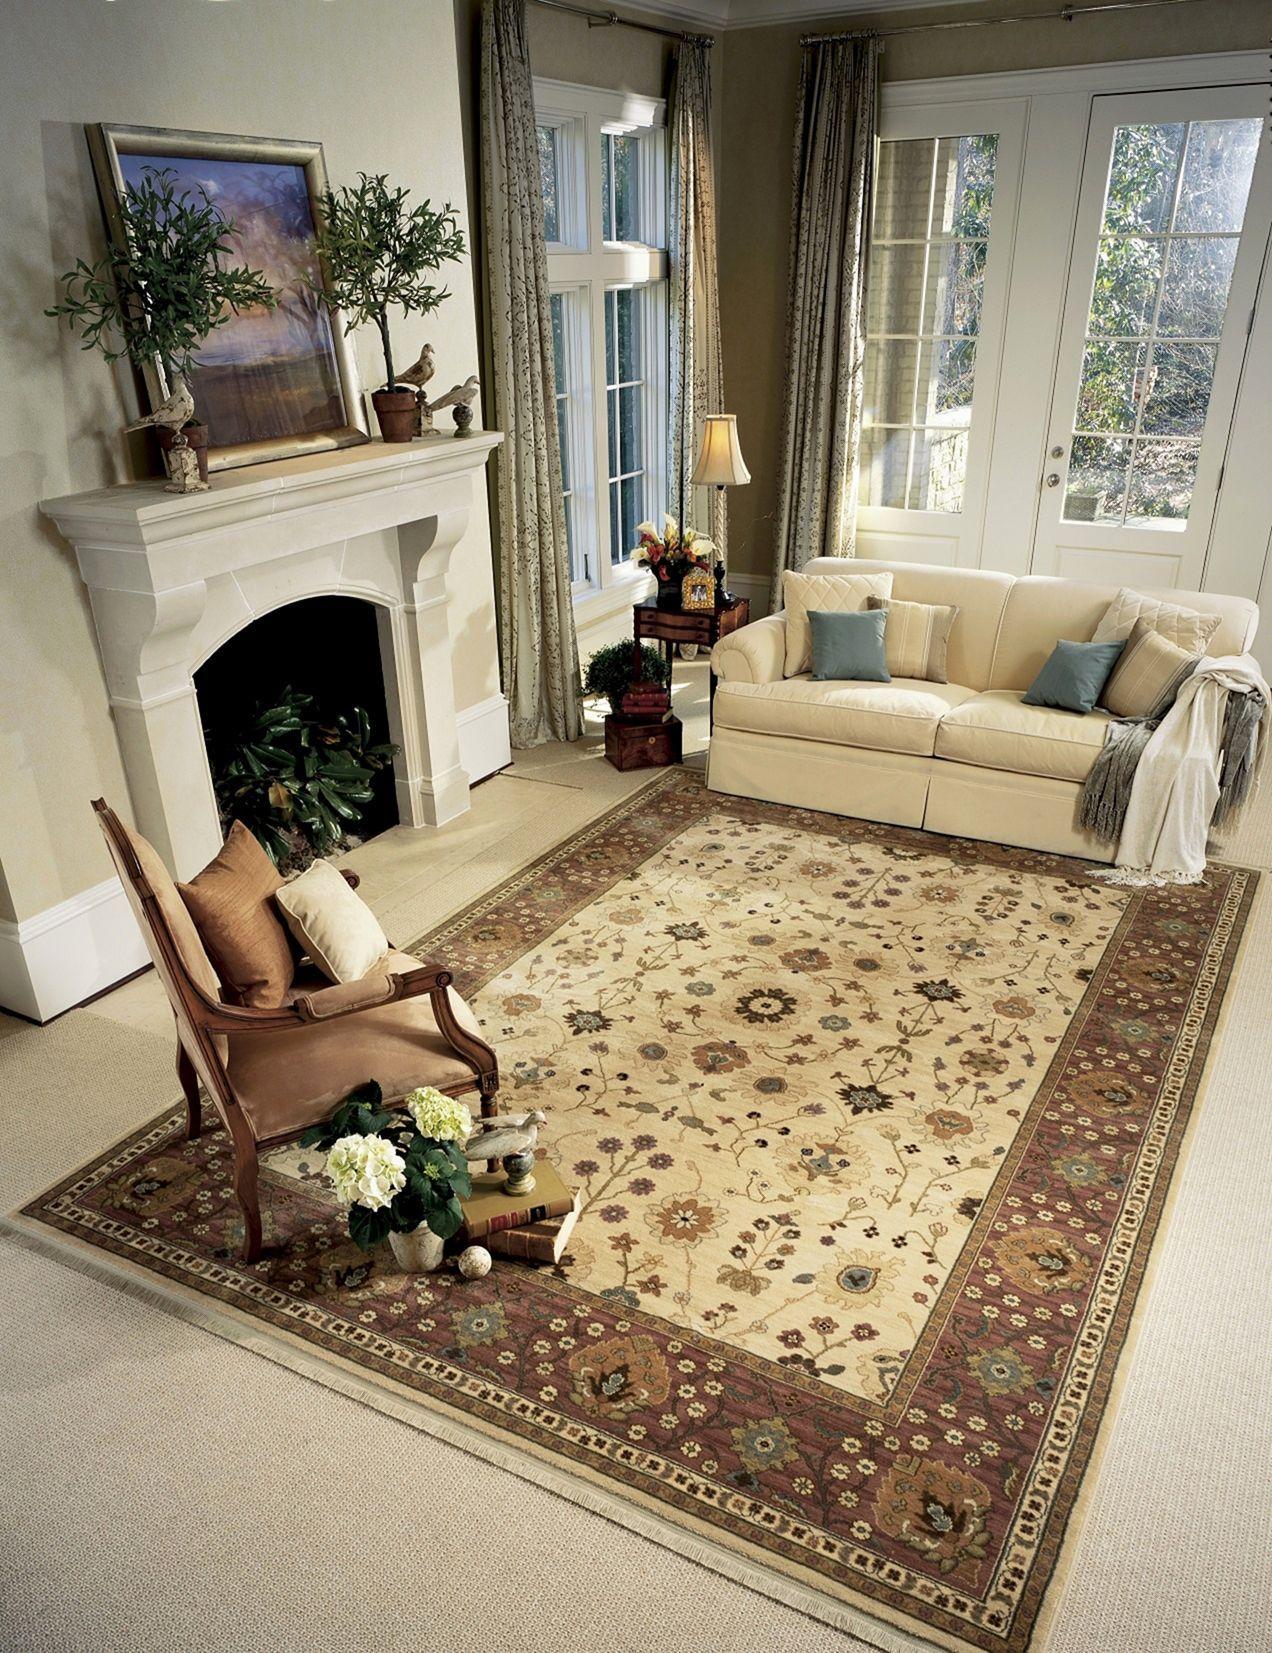 Living Room Interior Design Ideas Uk: 10 Best Home Interior Designs And Decorations To Inspire